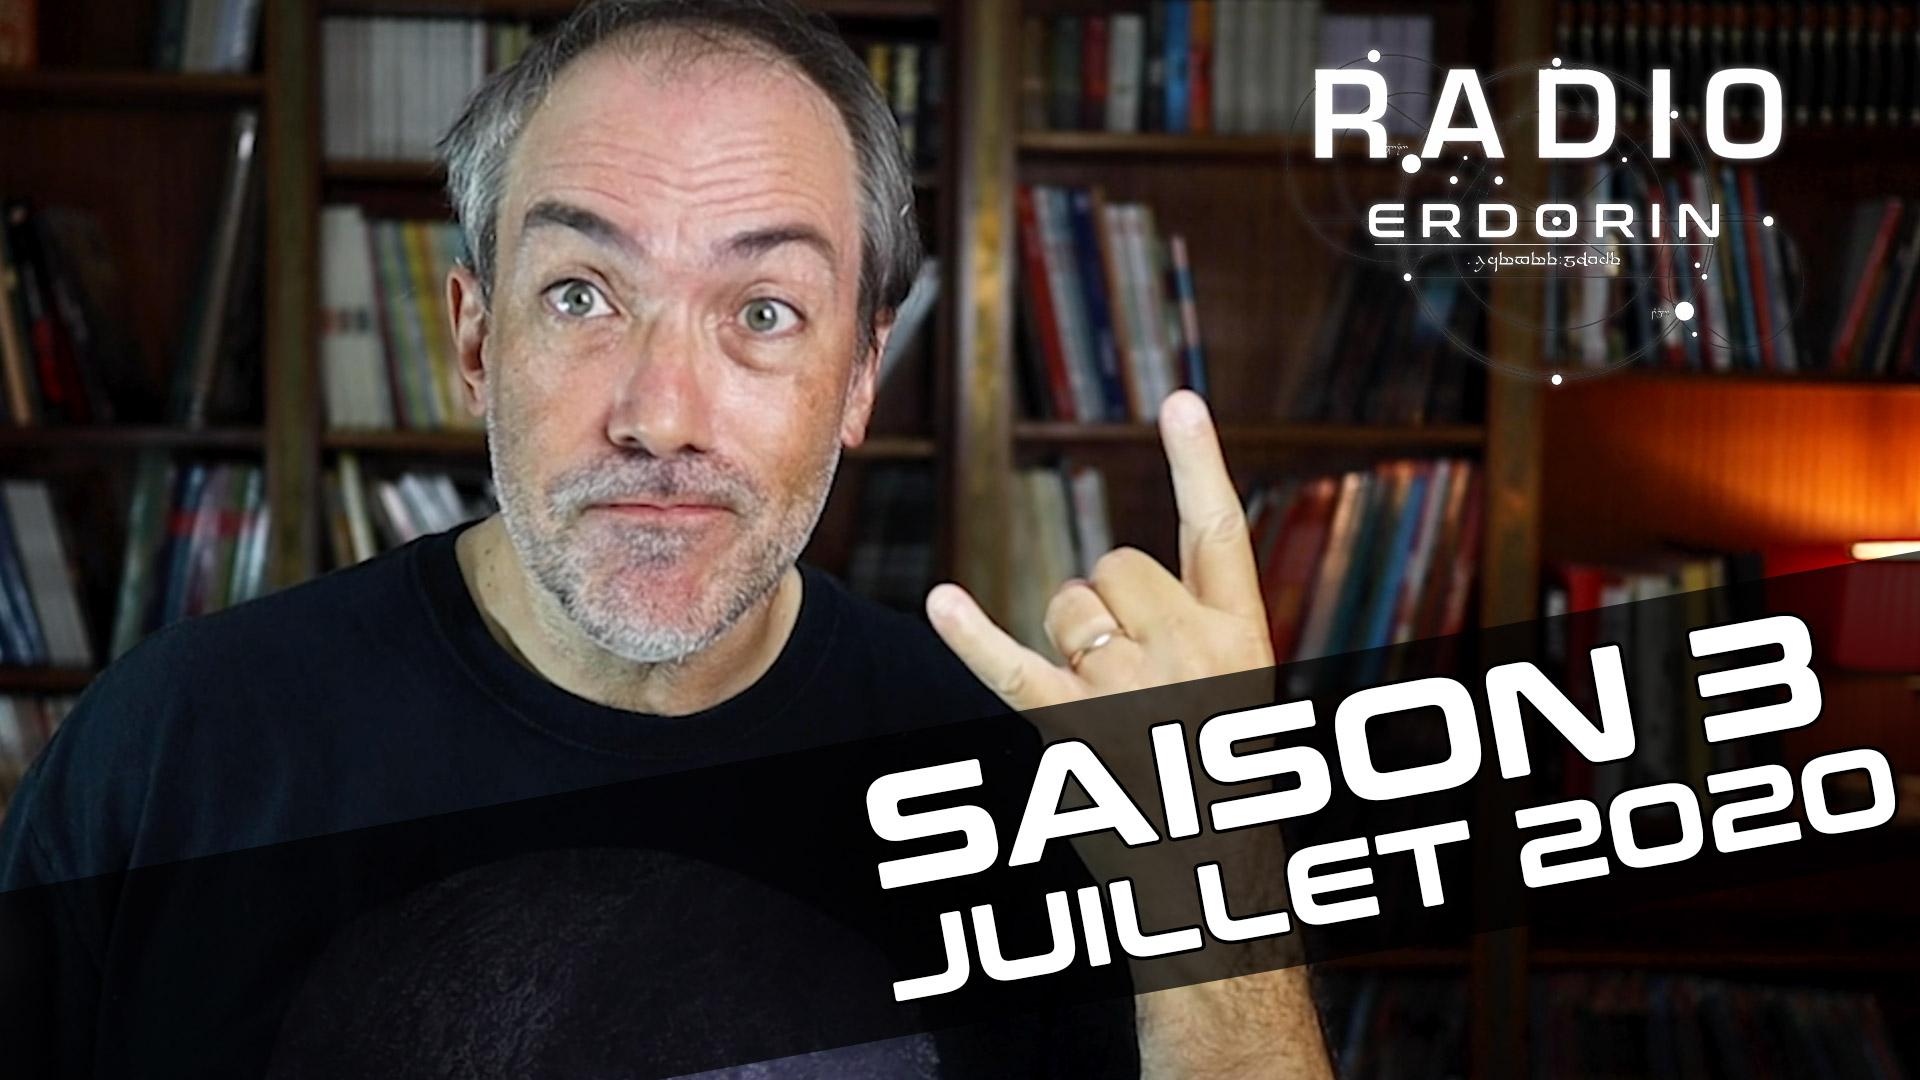 Radio-Erdorin S3E7 - Juillet 2020